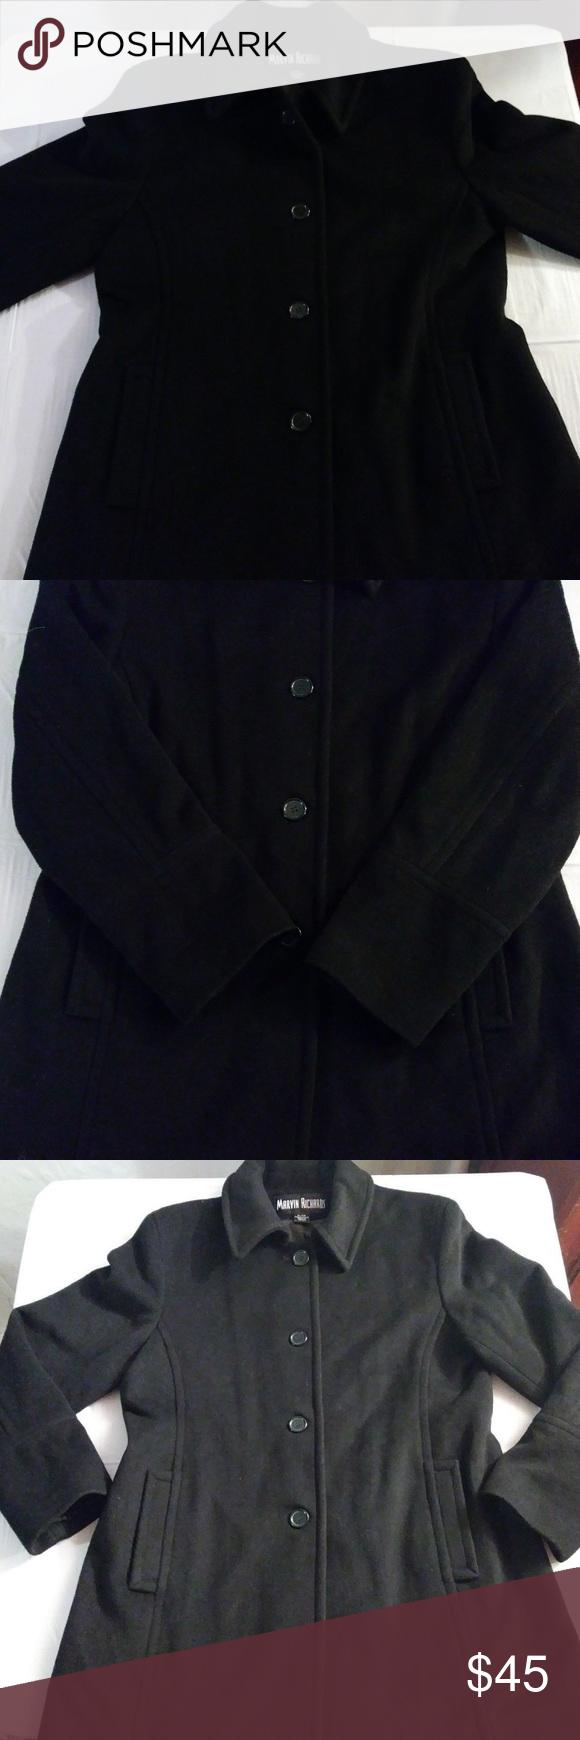 Wool cashmere flannel jacket  Marvin Richards Womenus xl Wool blend peacoat NWT  Pinterest